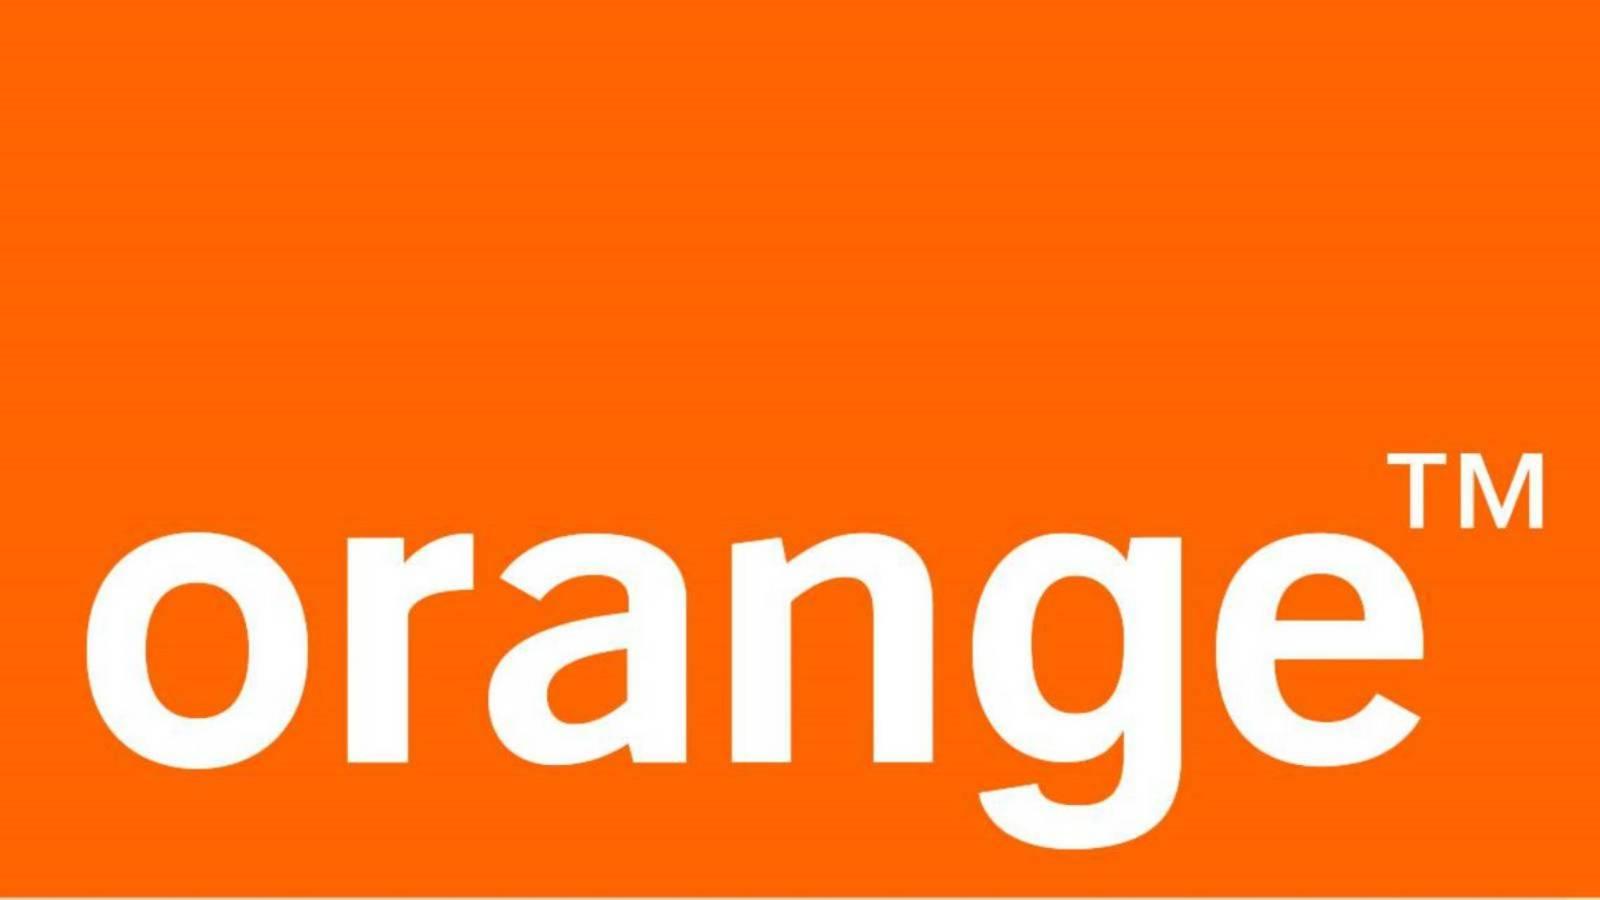 Orange aprobari